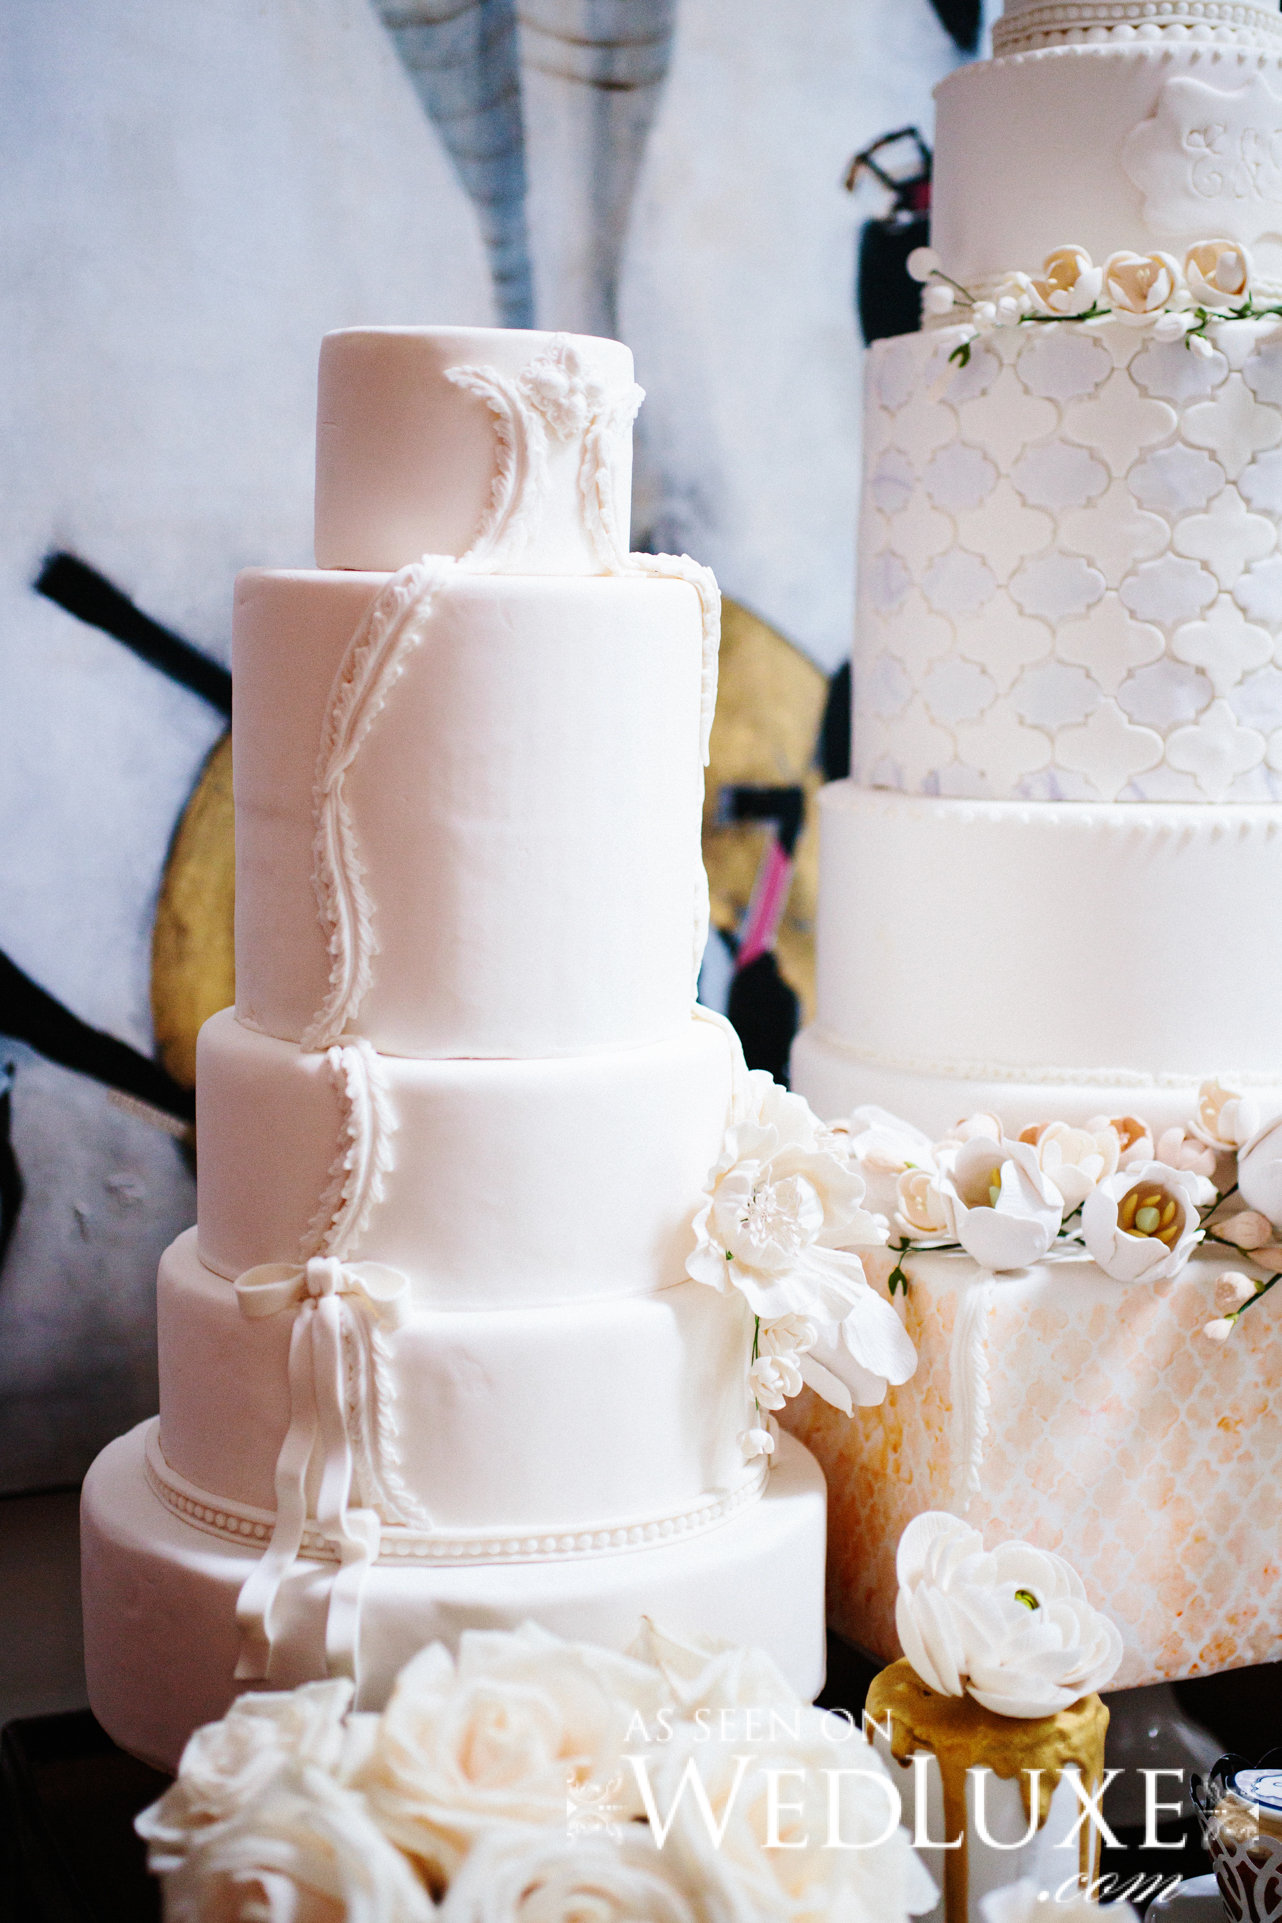 White wedding cake with sugar pearls